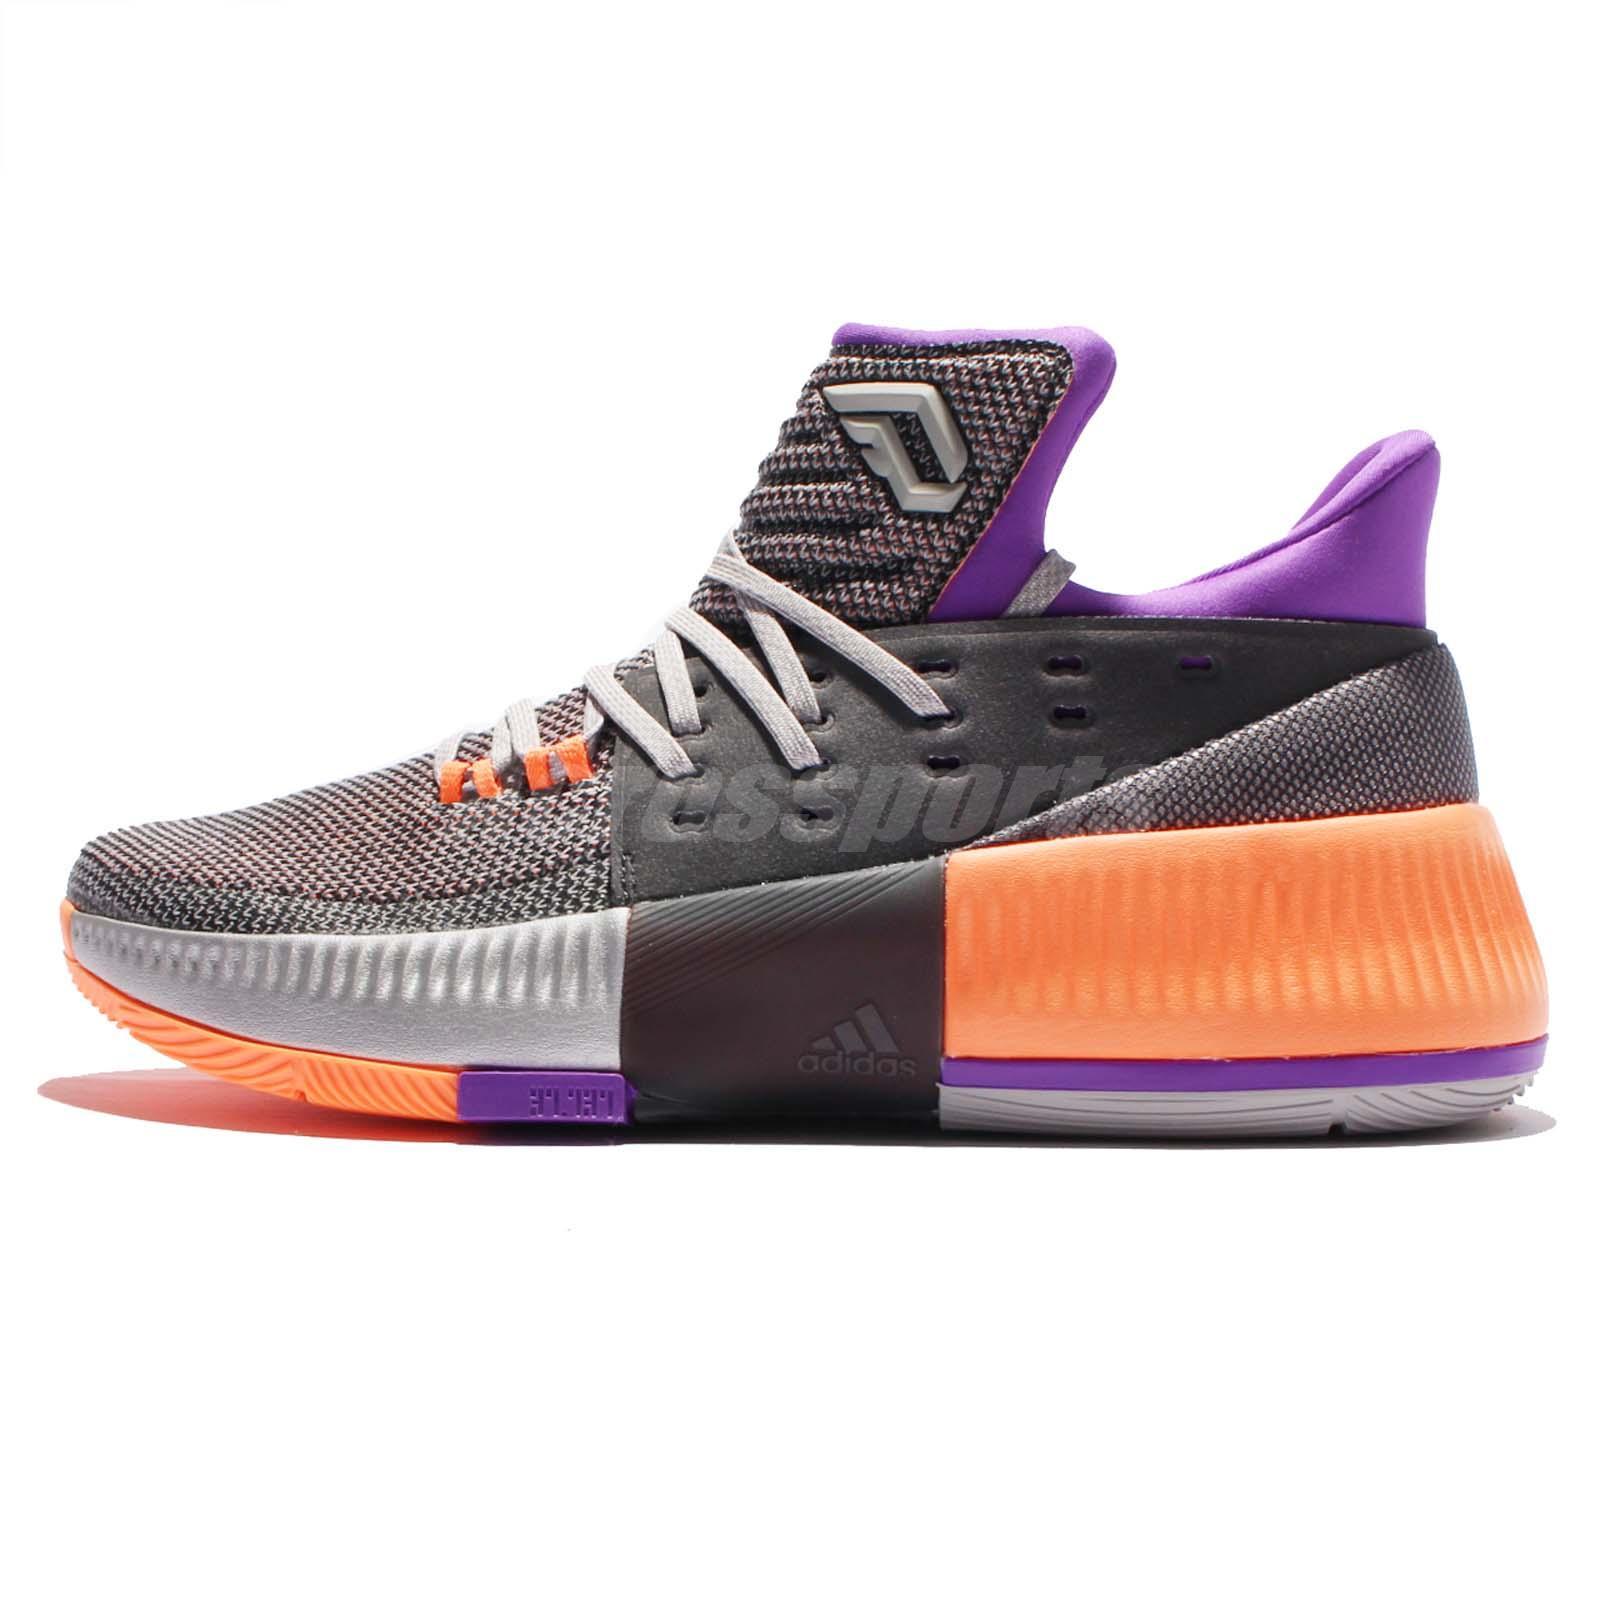 adidas basketball shoes damian lillard. Adidas D Lillard 3 Damian All Star Game ASG Men Basketball Shoes Sneakers BB8270